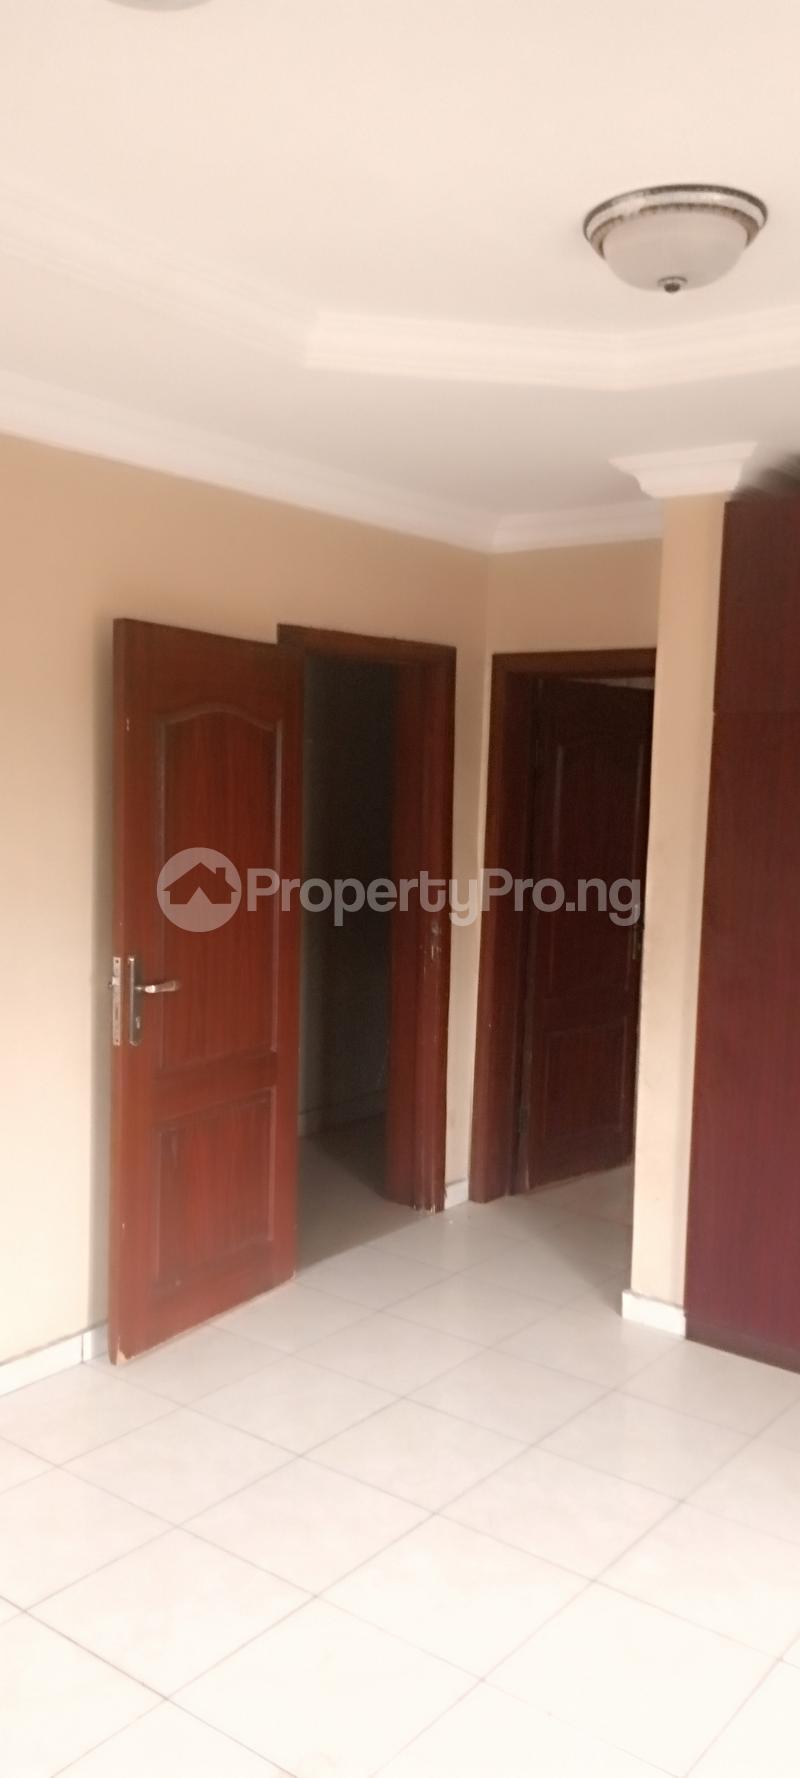 5 bedroom House for rent Estate drive Omole phase 2 Ojodu Lagos - 14